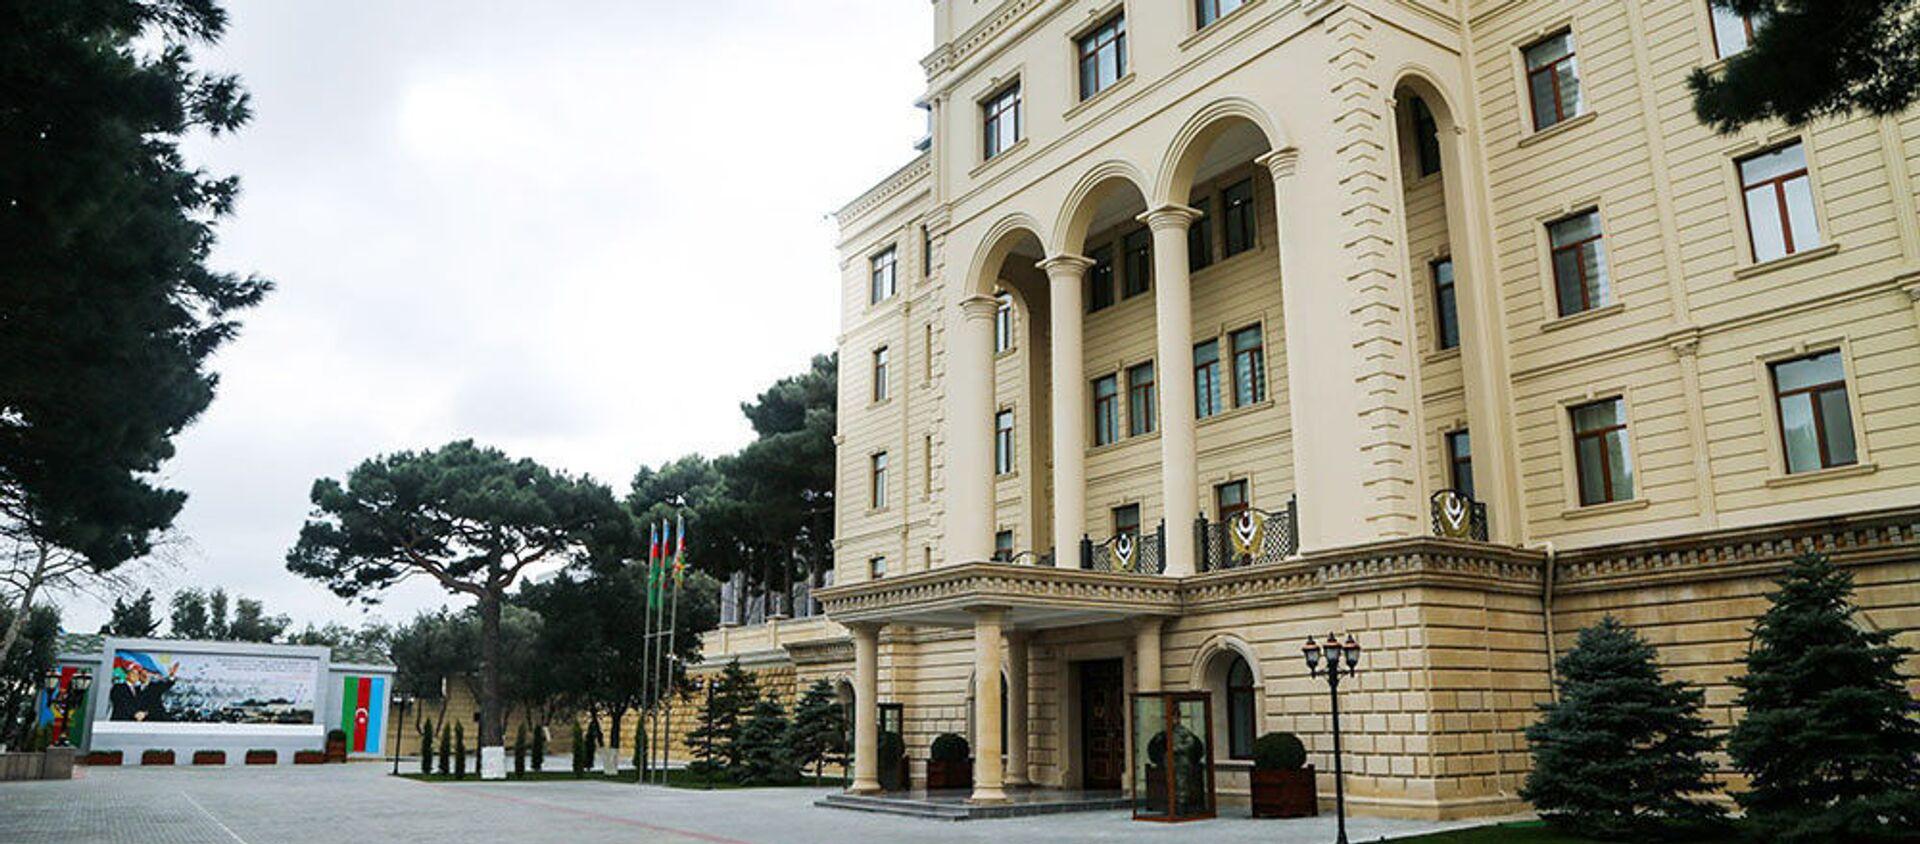 Здание министерства обороны Азербайджана - Sputnik Արմենիա, 1920, 12.09.2021